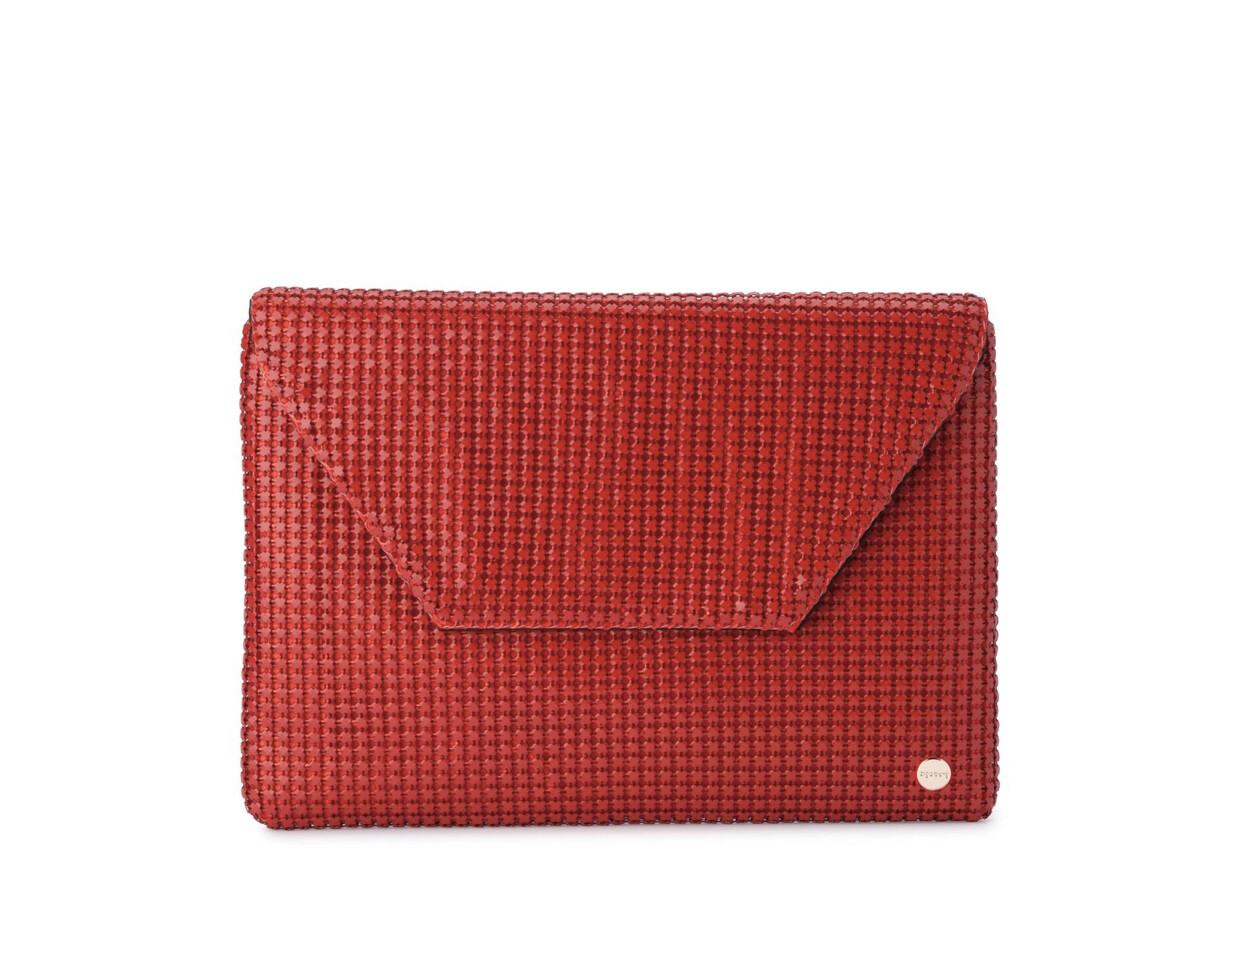 Starlight Mesh Envelope Clutch Red